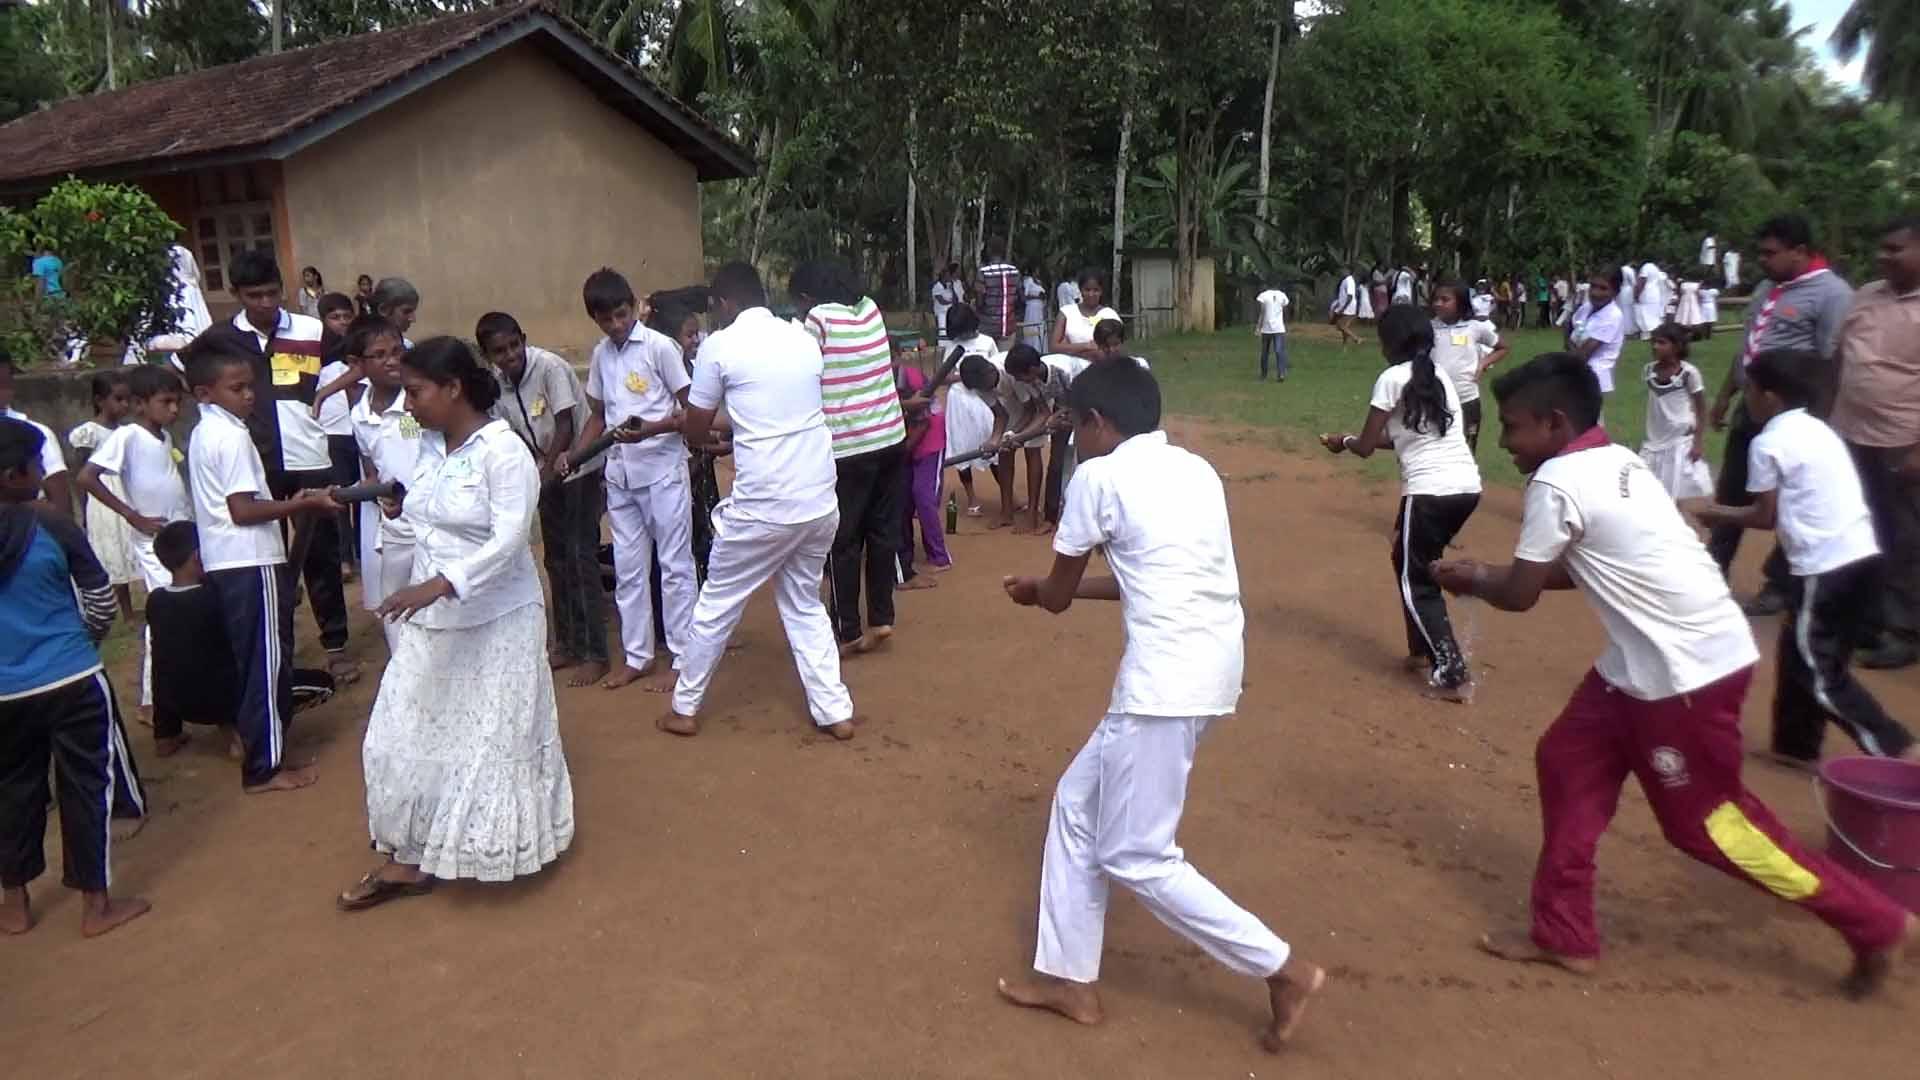 Sati Pasala Mindfulness Camp at Meethirigala Kanishta Vidyalaya-mindful games (21)